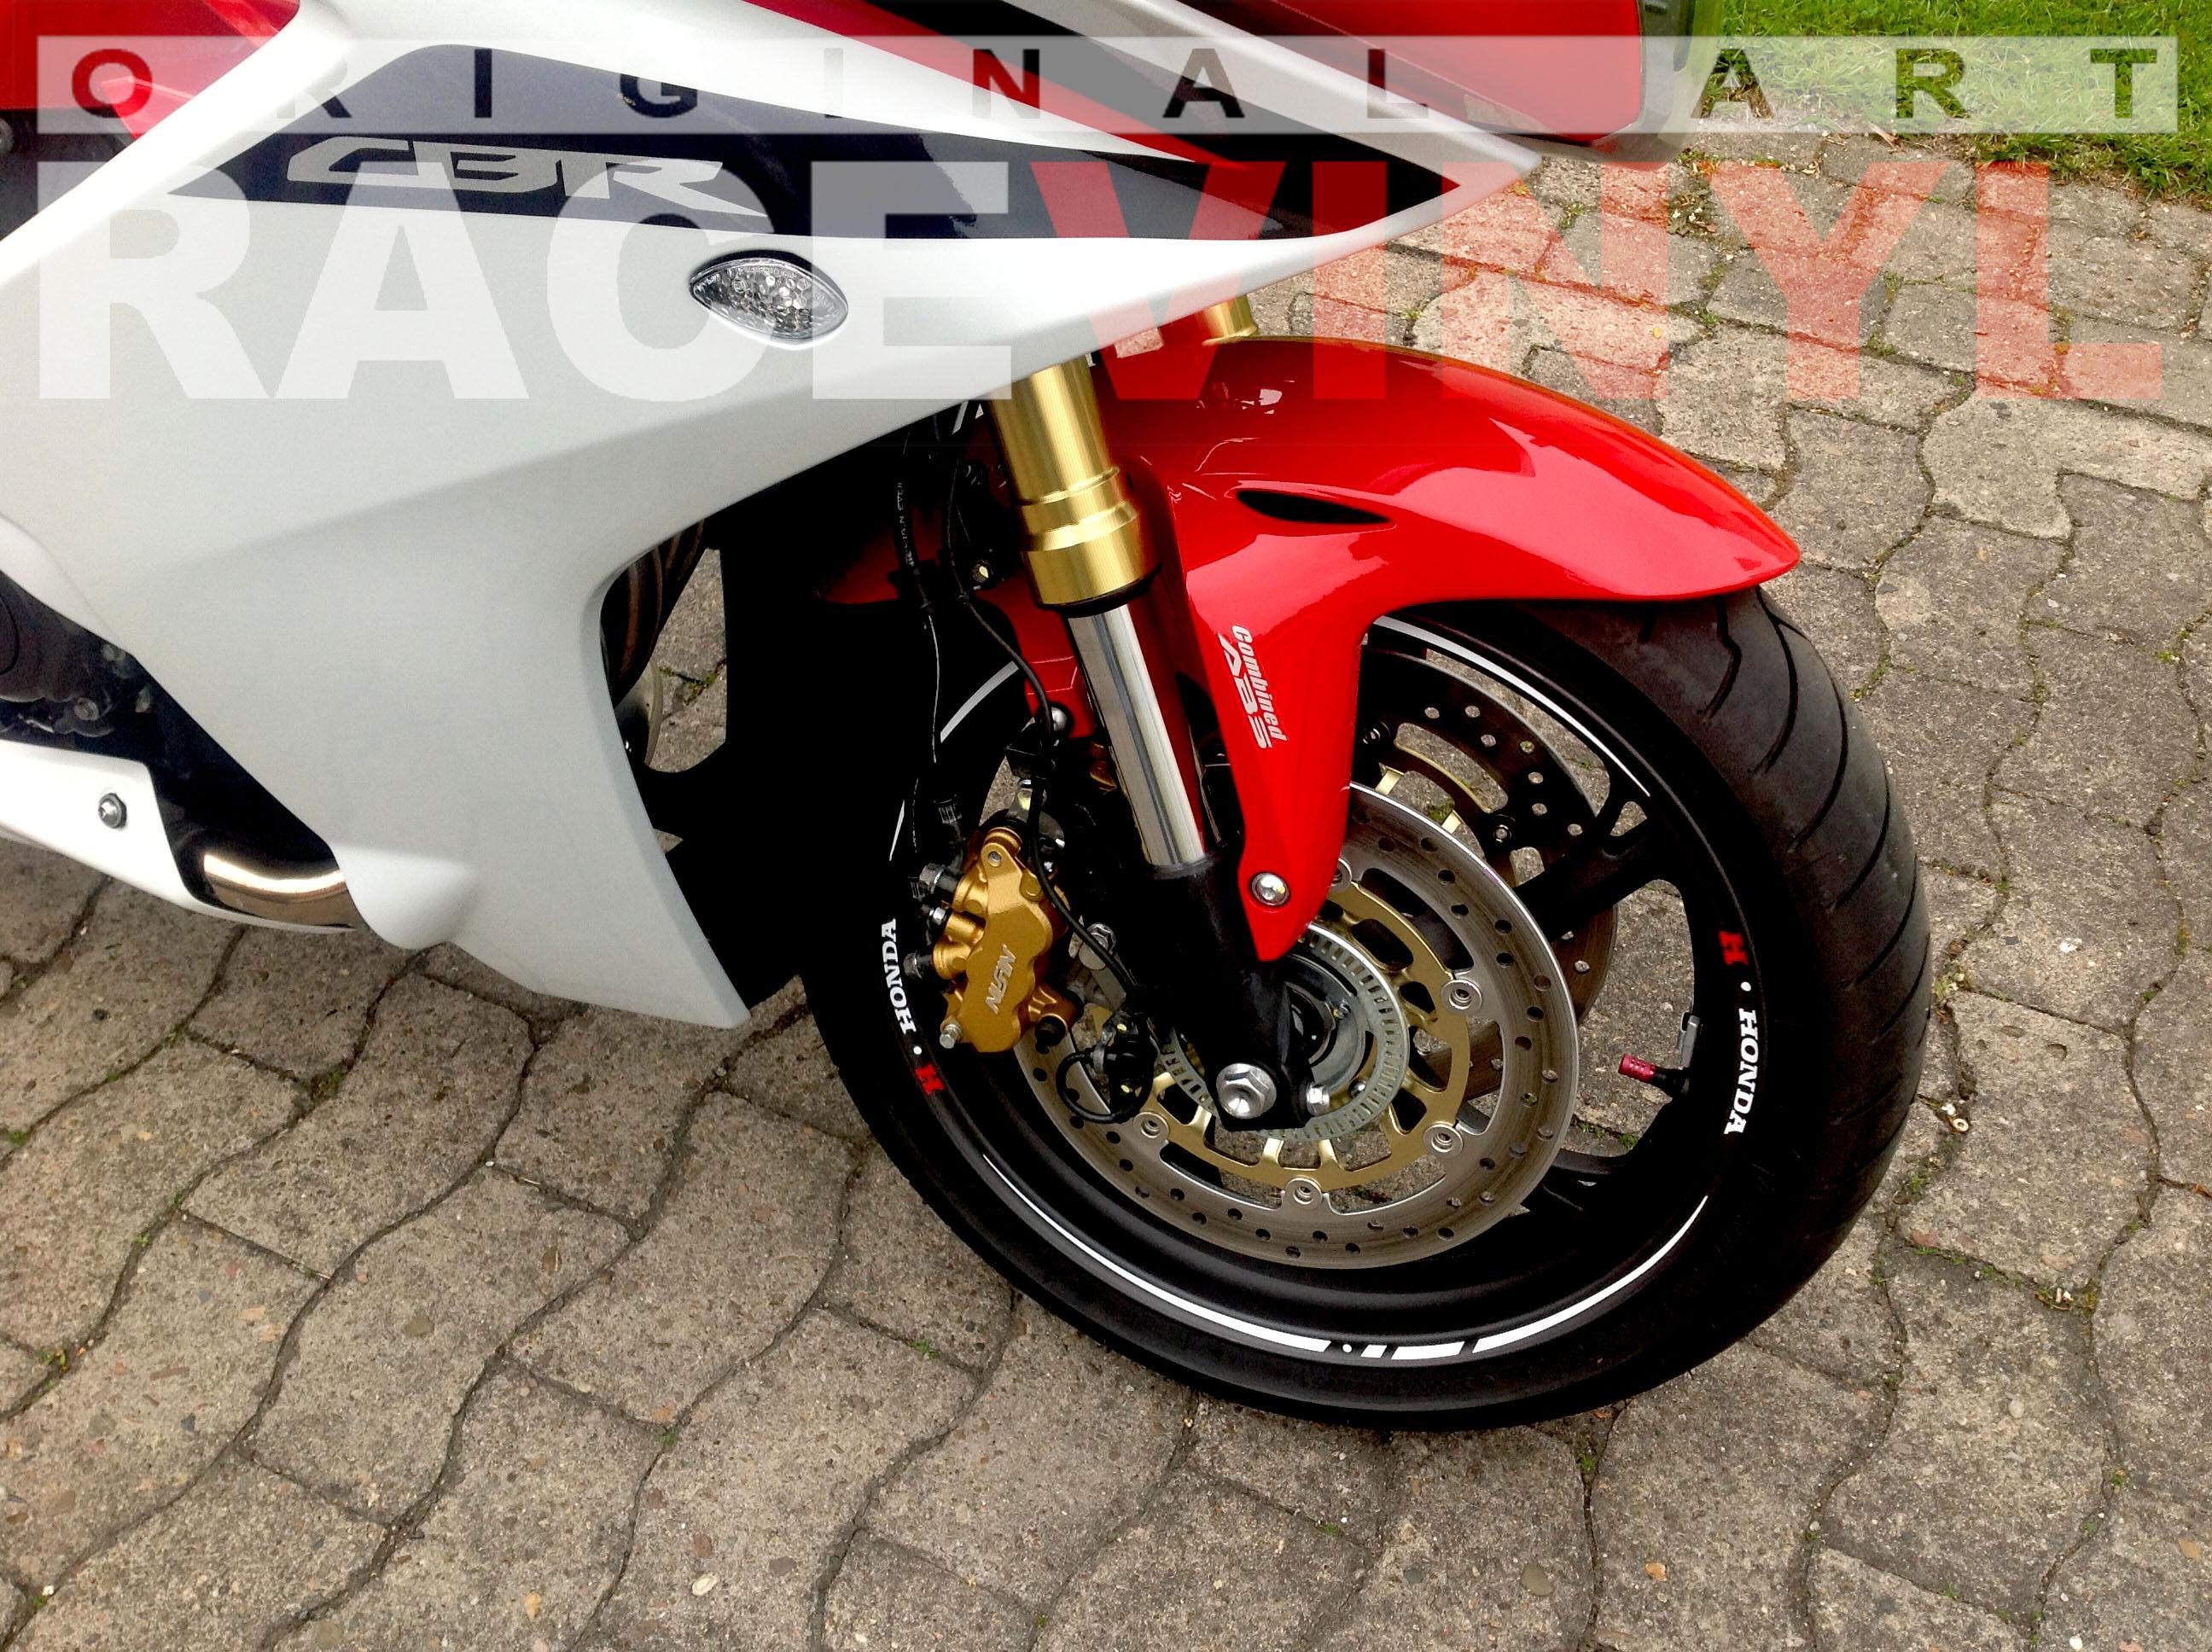 Honda CBR 600 F 2012 Adhesivos Race Blanco con Logo de Honda Racevinyl